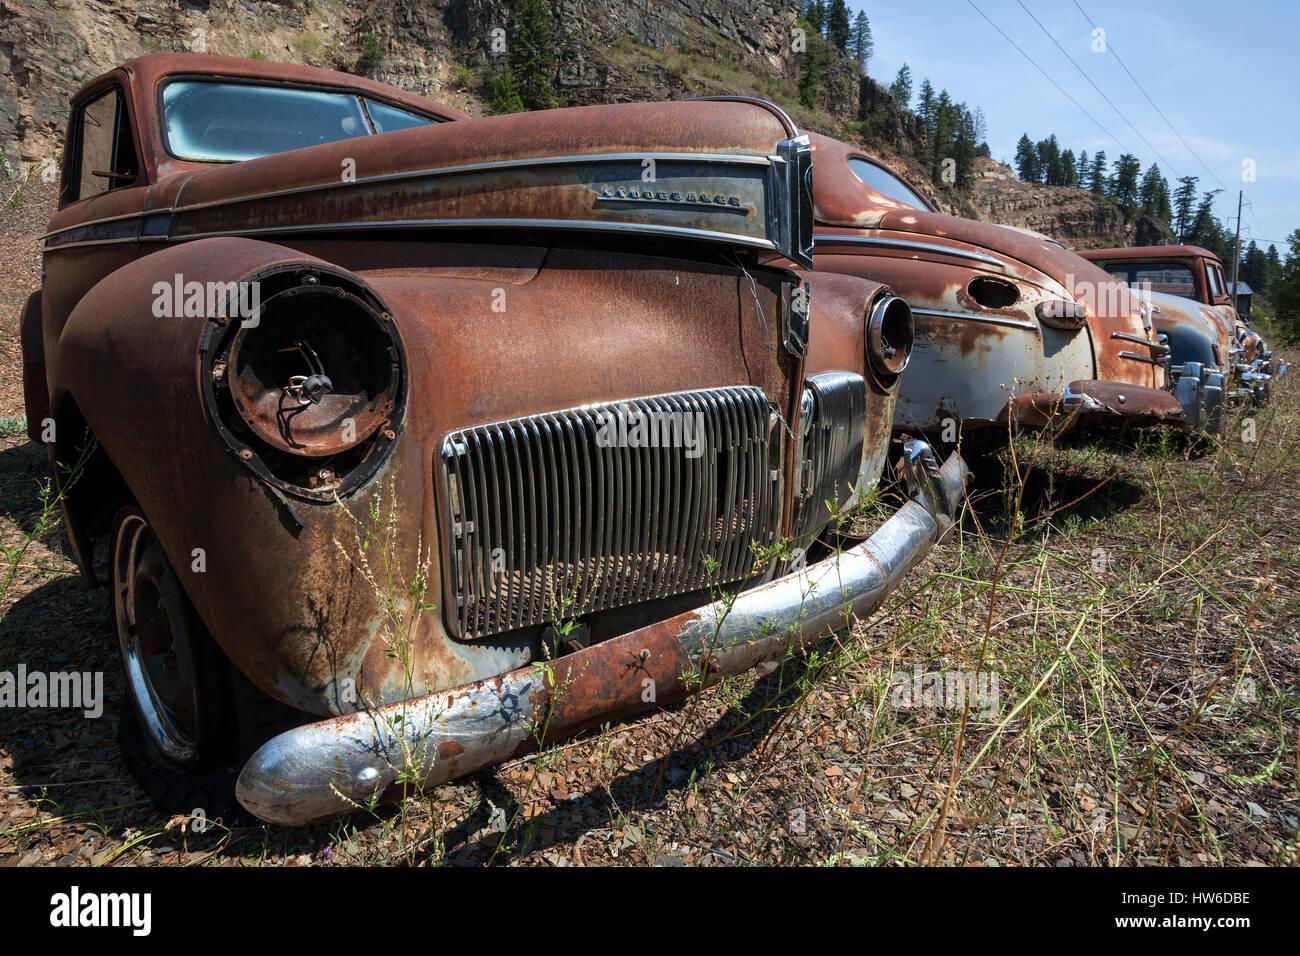 Oldtimer, Studebaker Champion, scrap cars, near Spokane, Washington, USA - Stock Image